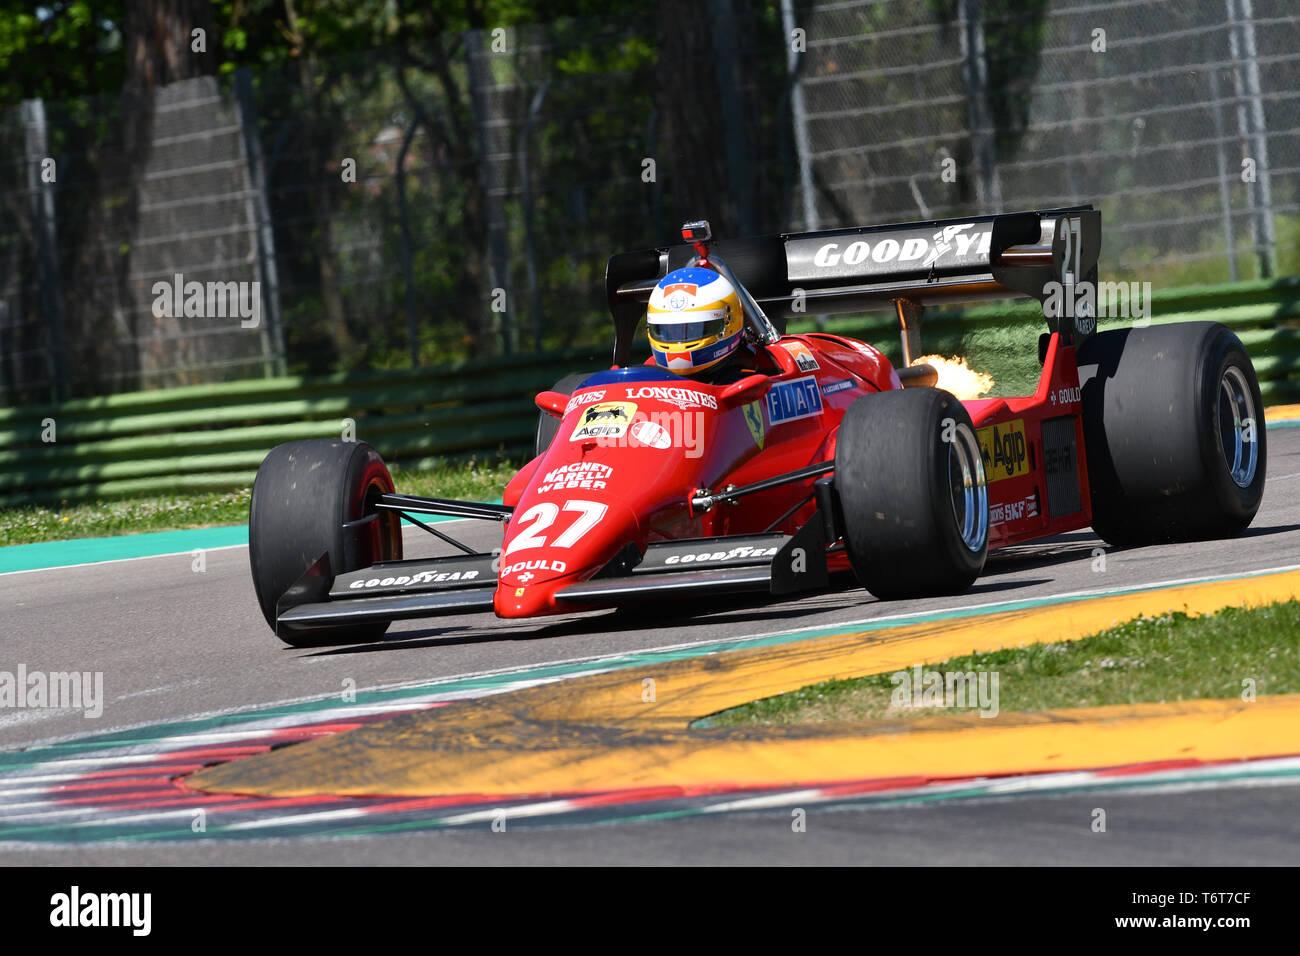 Imola, 27 April 2019: Unknown run with Historic 1984 Ferrari F1 Car model 126 C4 ex Michele Alboreto / René Arnoux in action - Stock Image